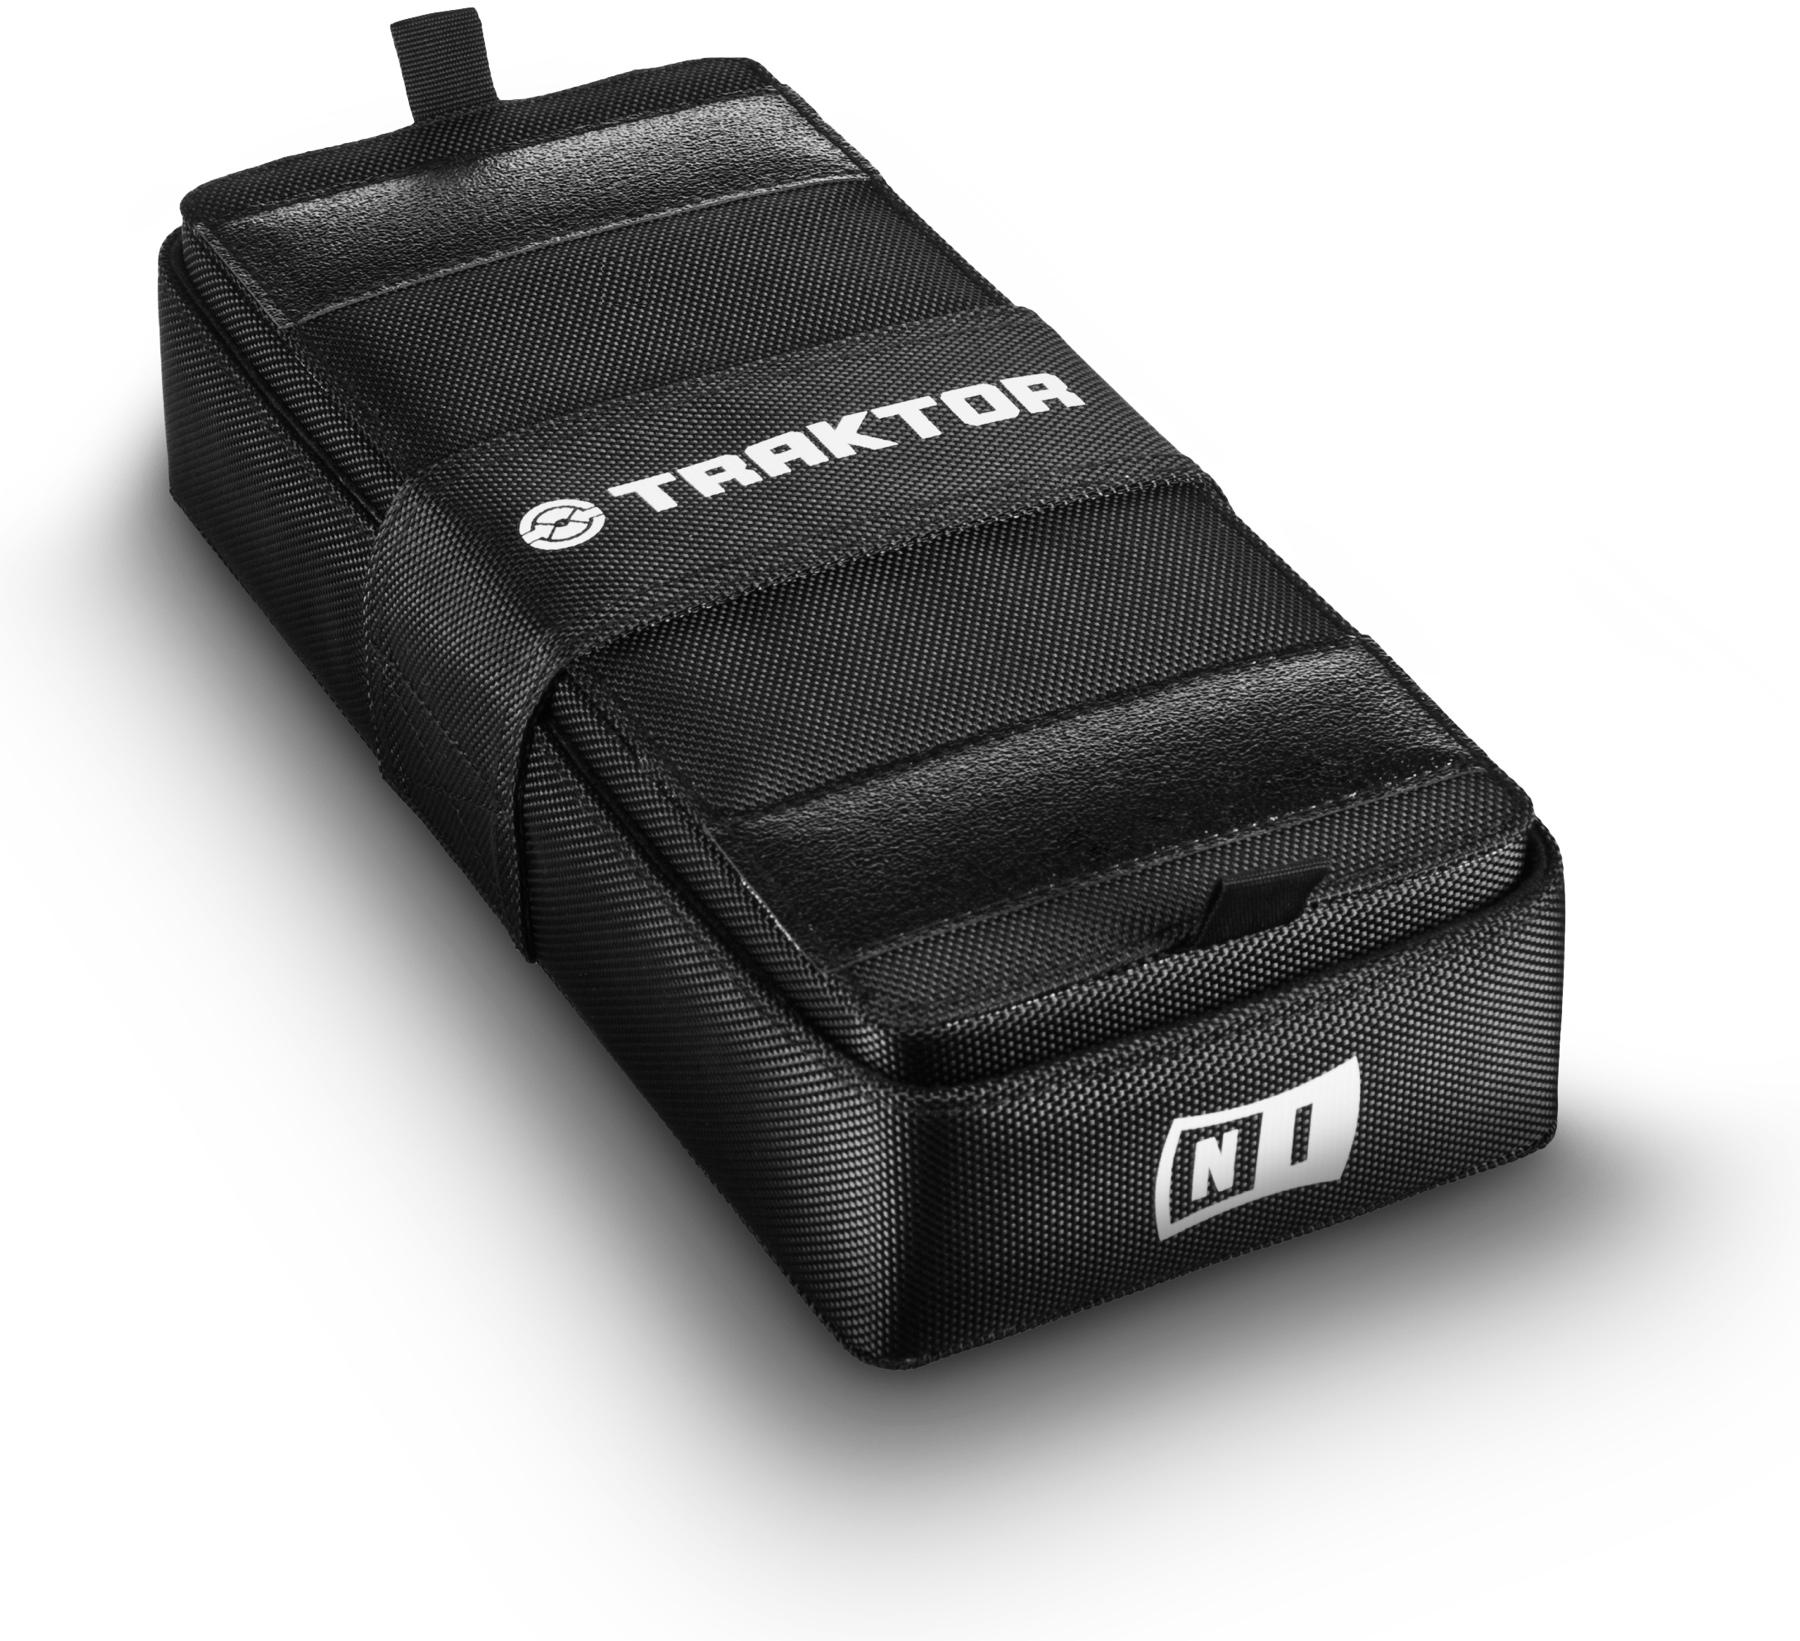 Native Instruments Traktor Kontrol X1 Bag